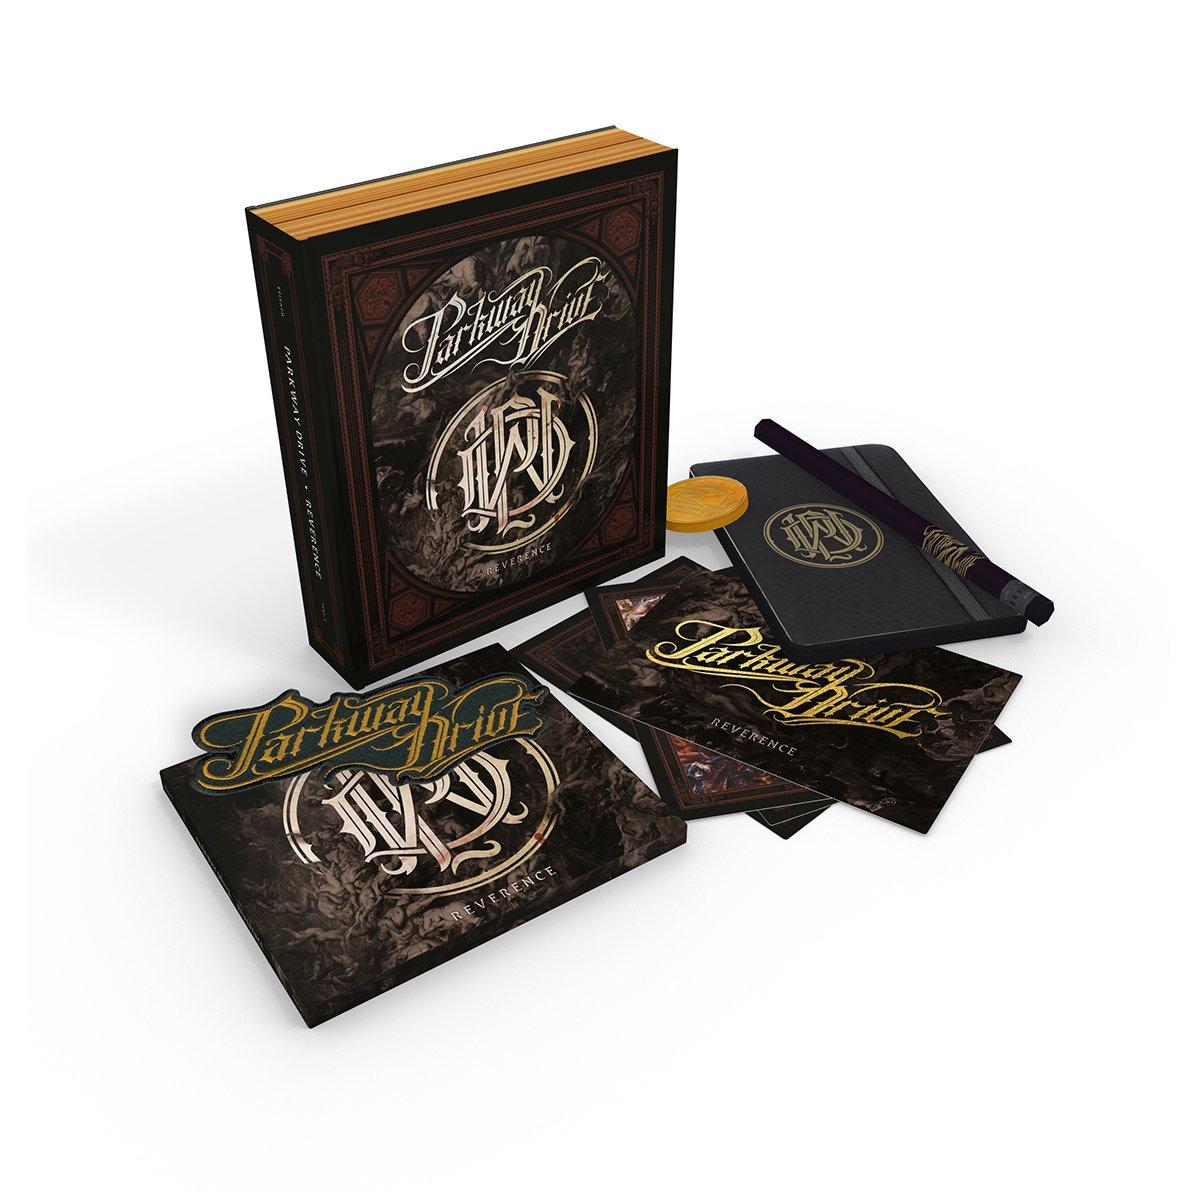 IMAGE | Reverence CD DLX Box Set